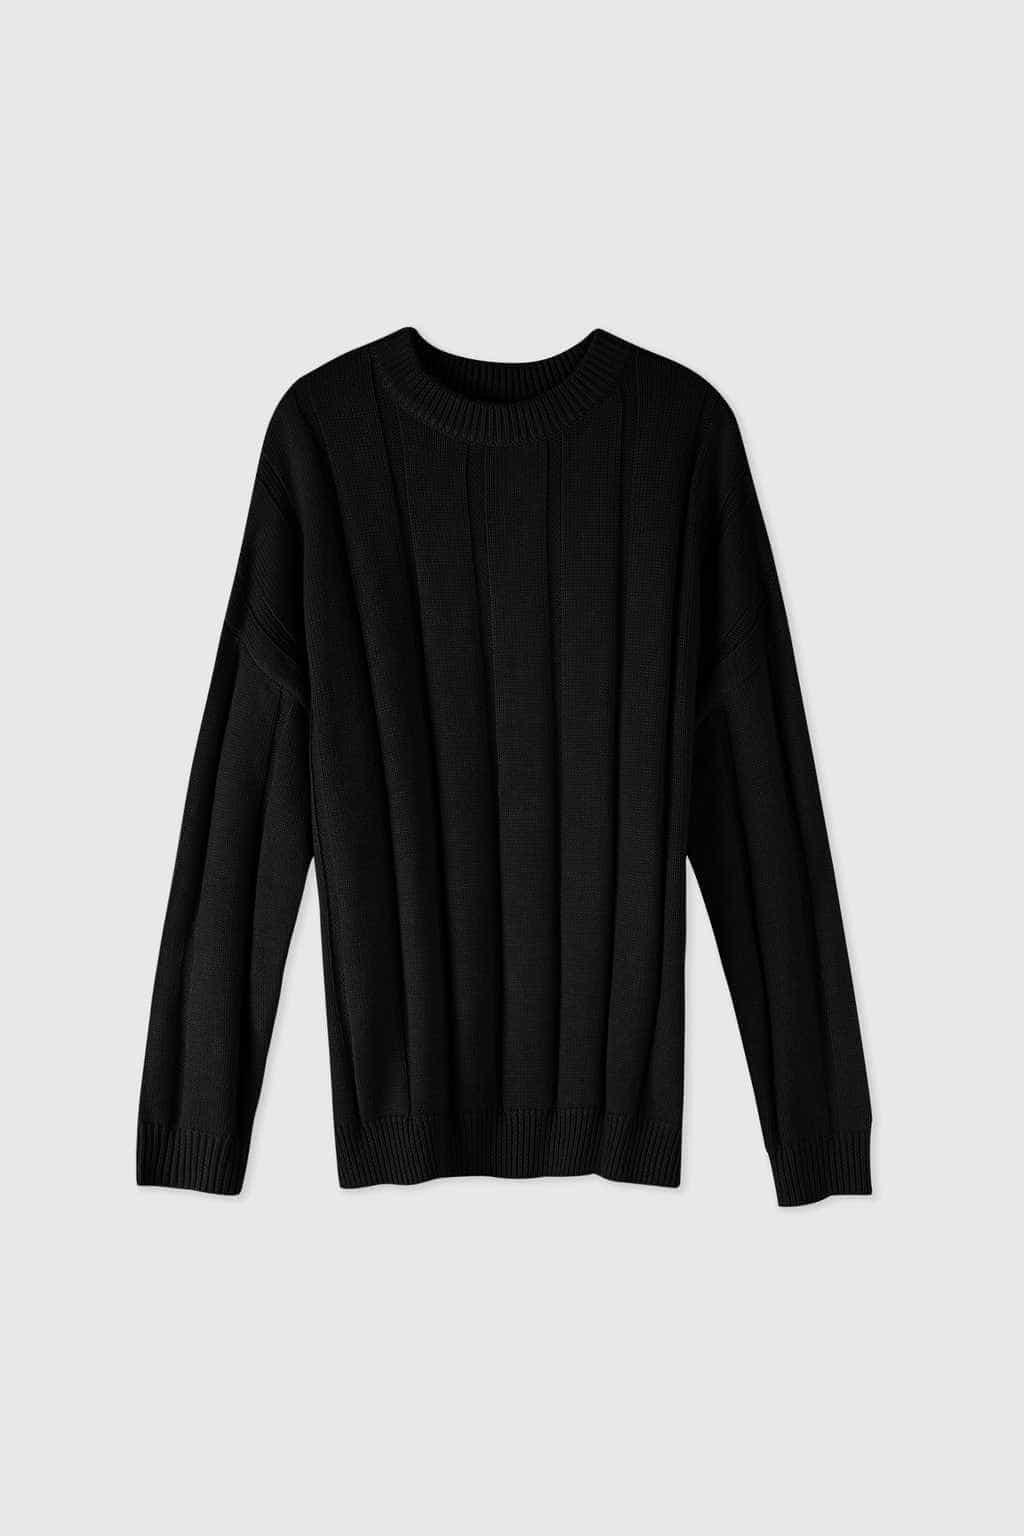 Sweater 2620 Black 13